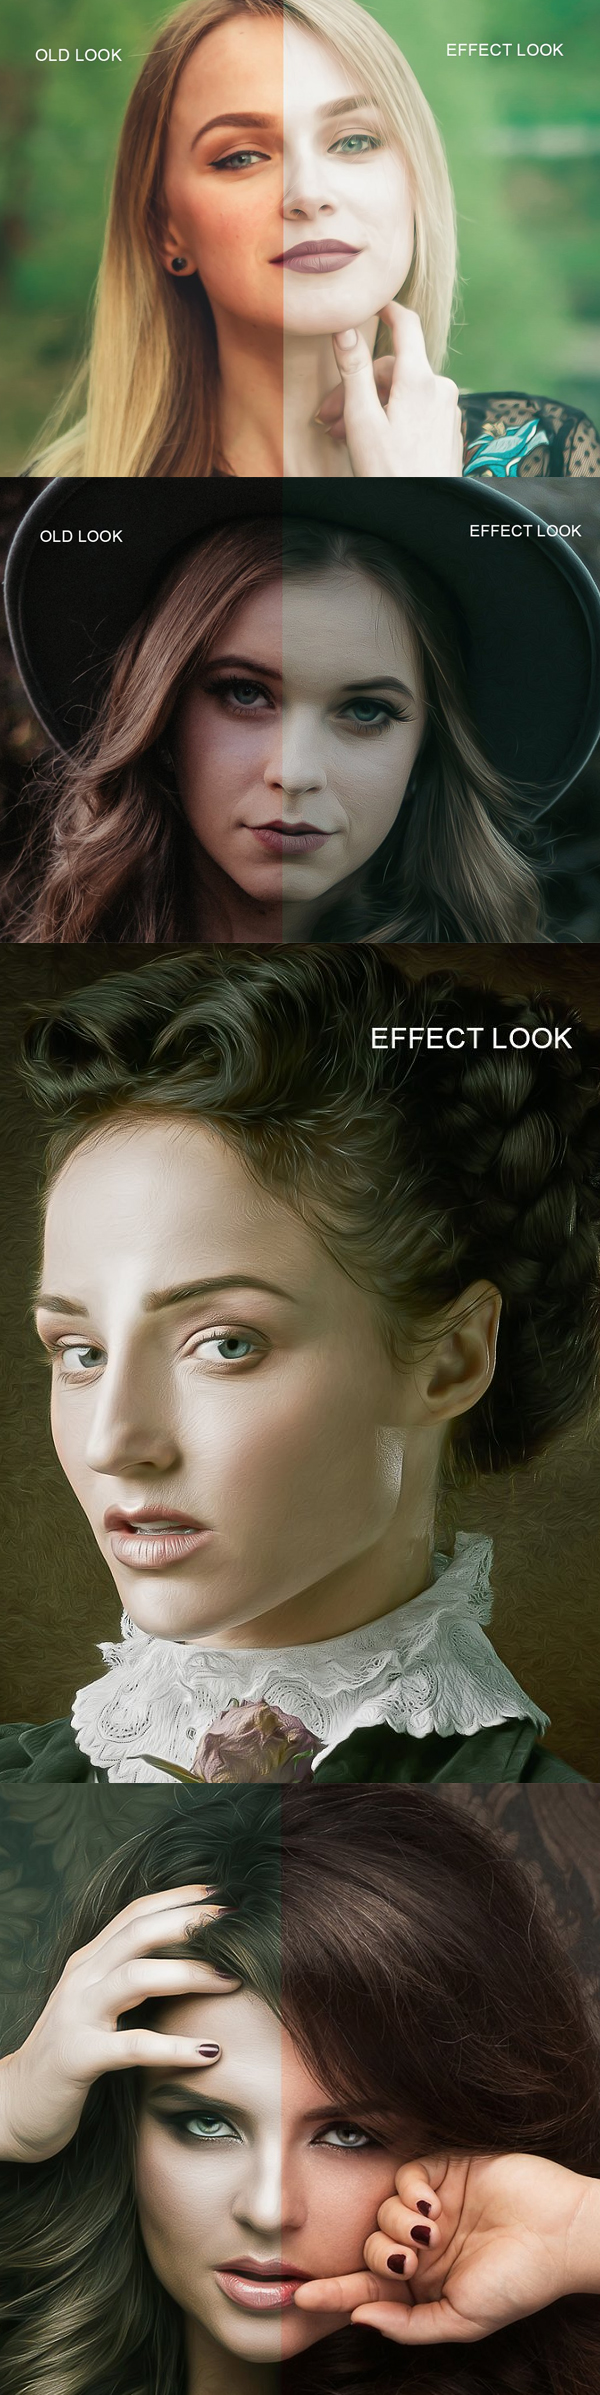 Pro Glamour Girl Effect Photoshop Action